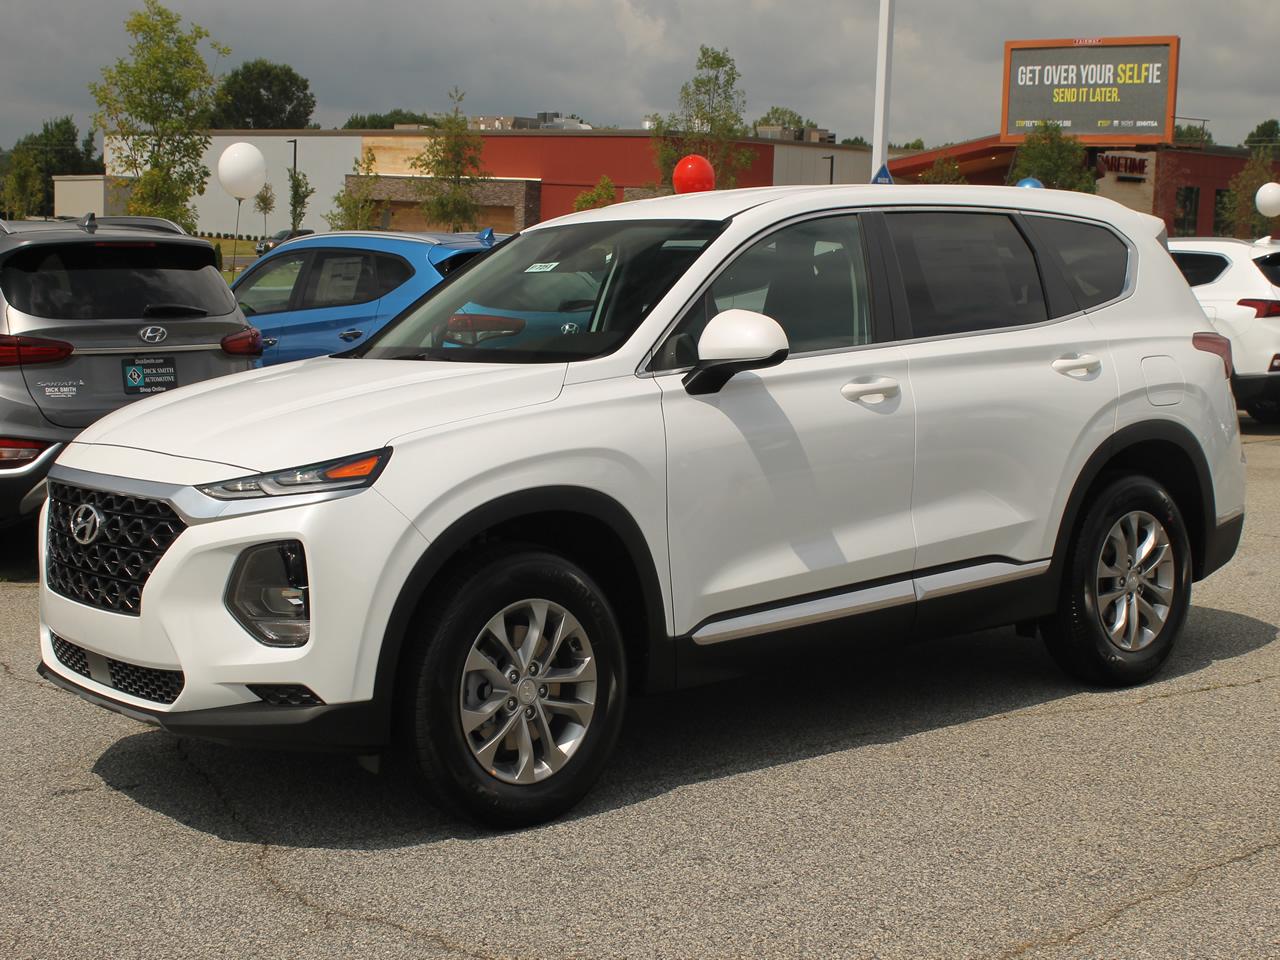 Dick Smith Hyundai >> NEW 2019 HYUNDAI SANTA FE SE 2.4 VIN 5NMS23AD1KH013364 - Hyundai in Greenville | Hyundai ...